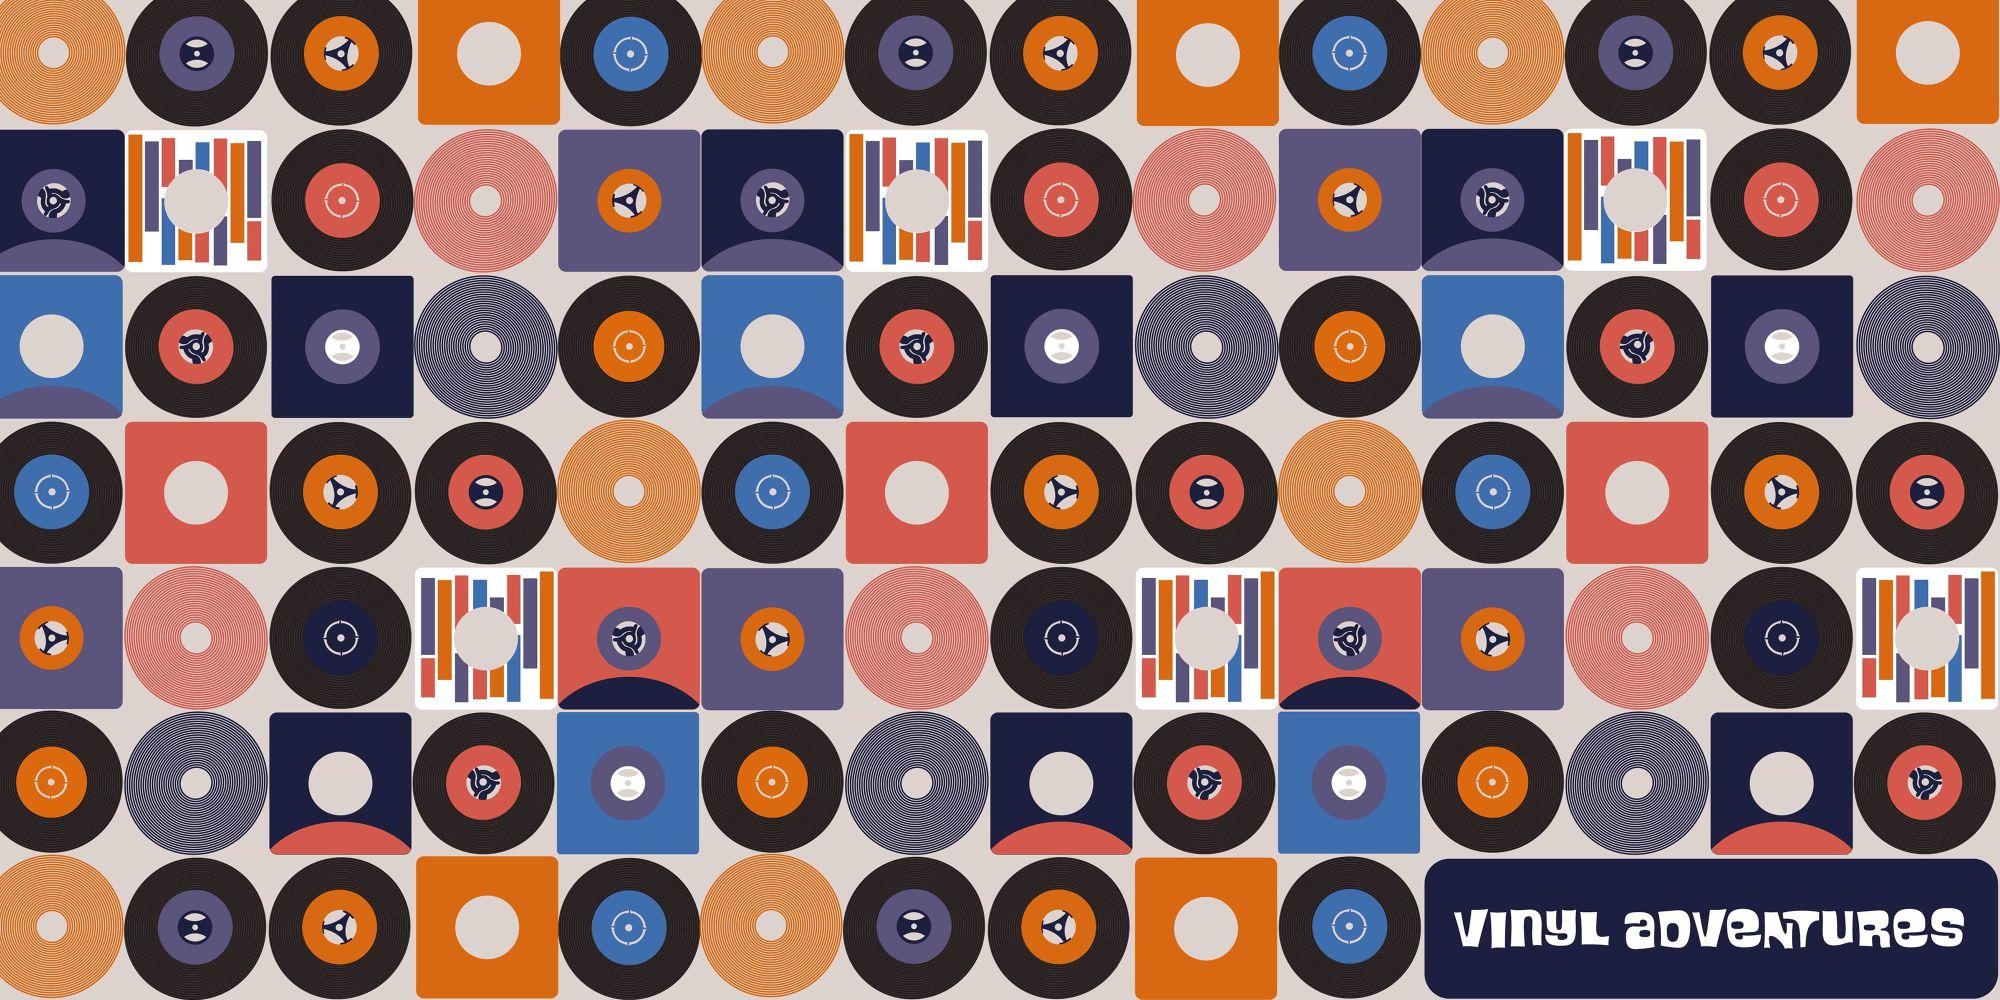 vinyl_adventures_banner_(1).jpg